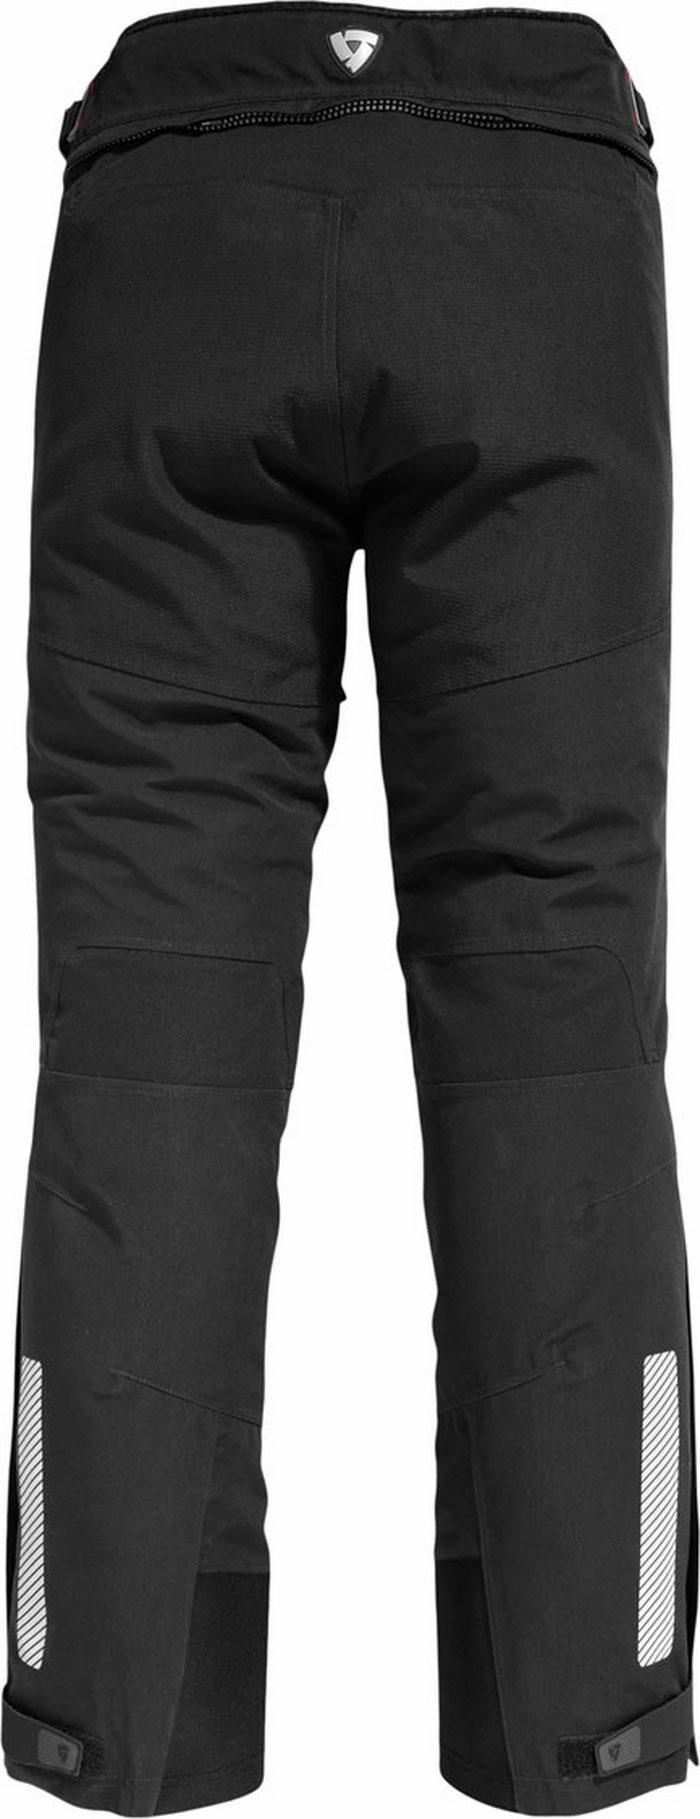 Pantaloni moto Rev'it Everest GTX - Accorciato